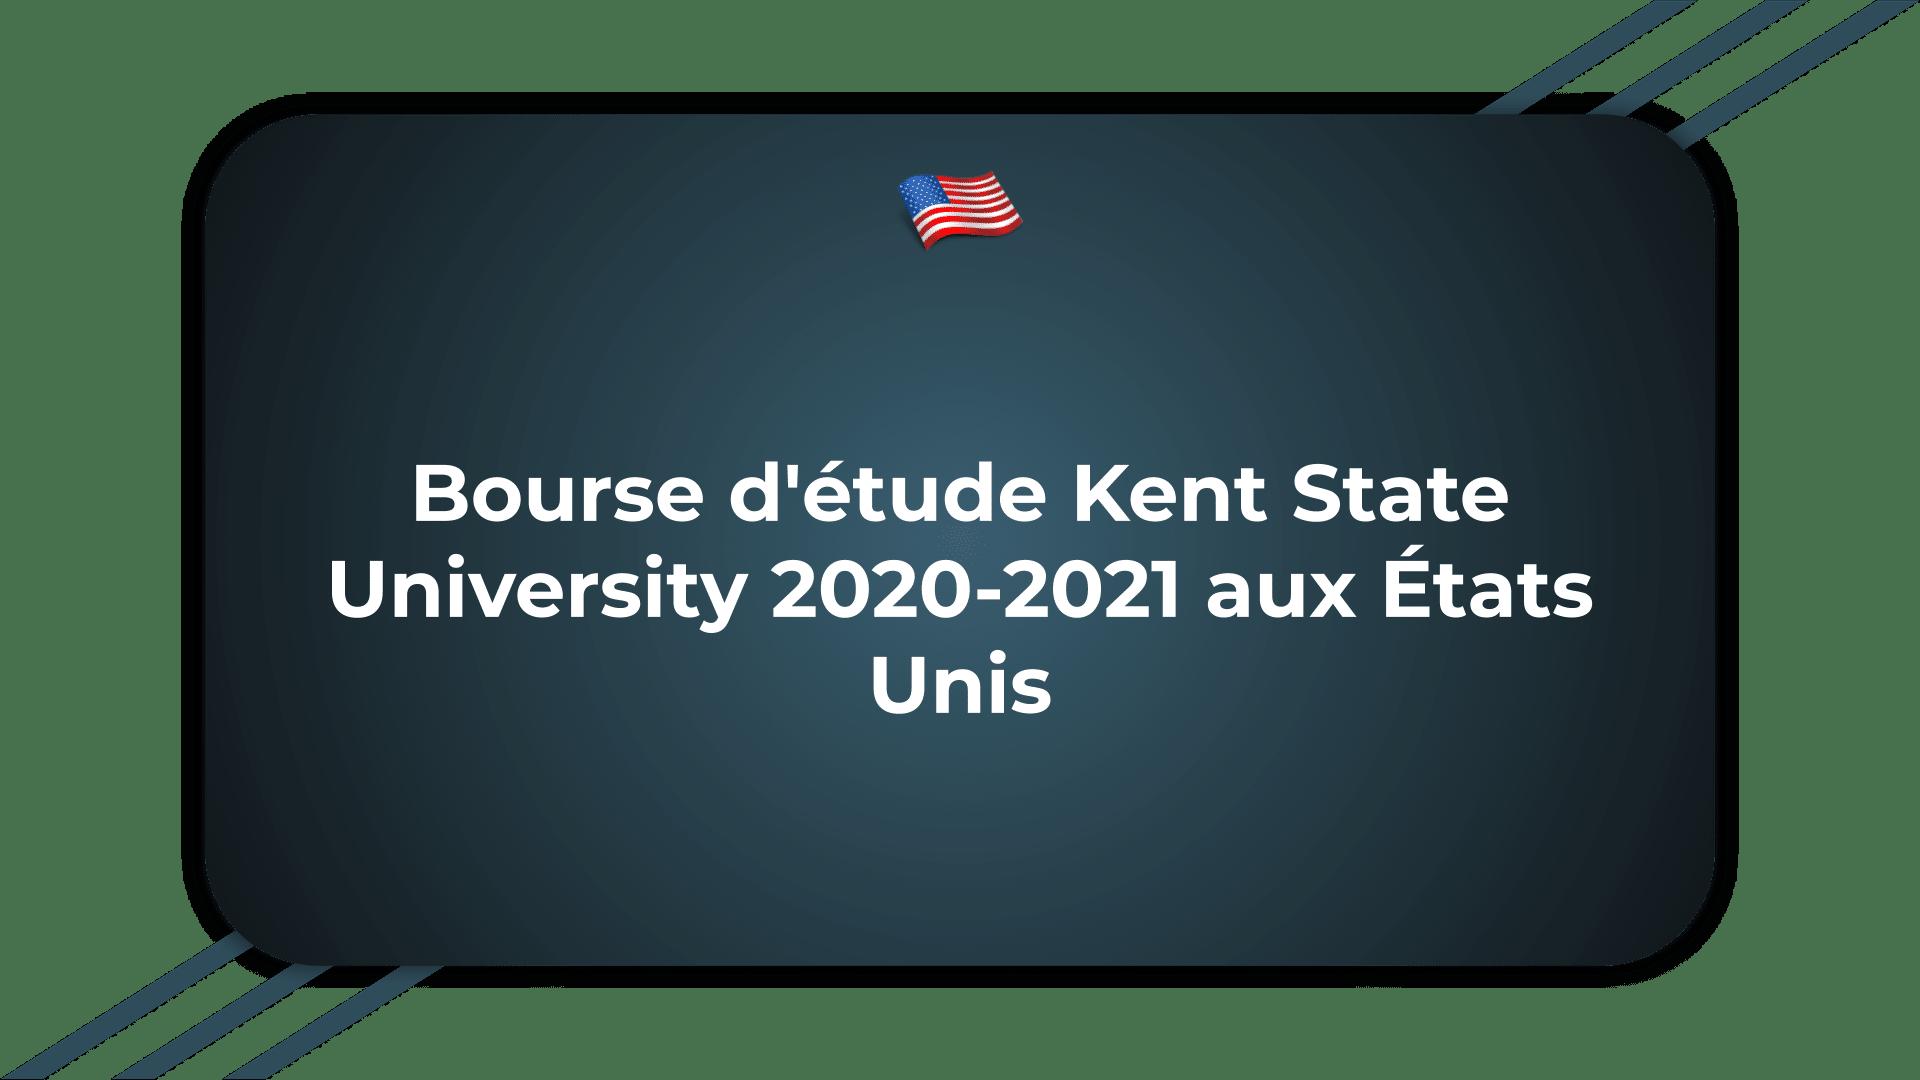 Bourse d'étude Kent State University